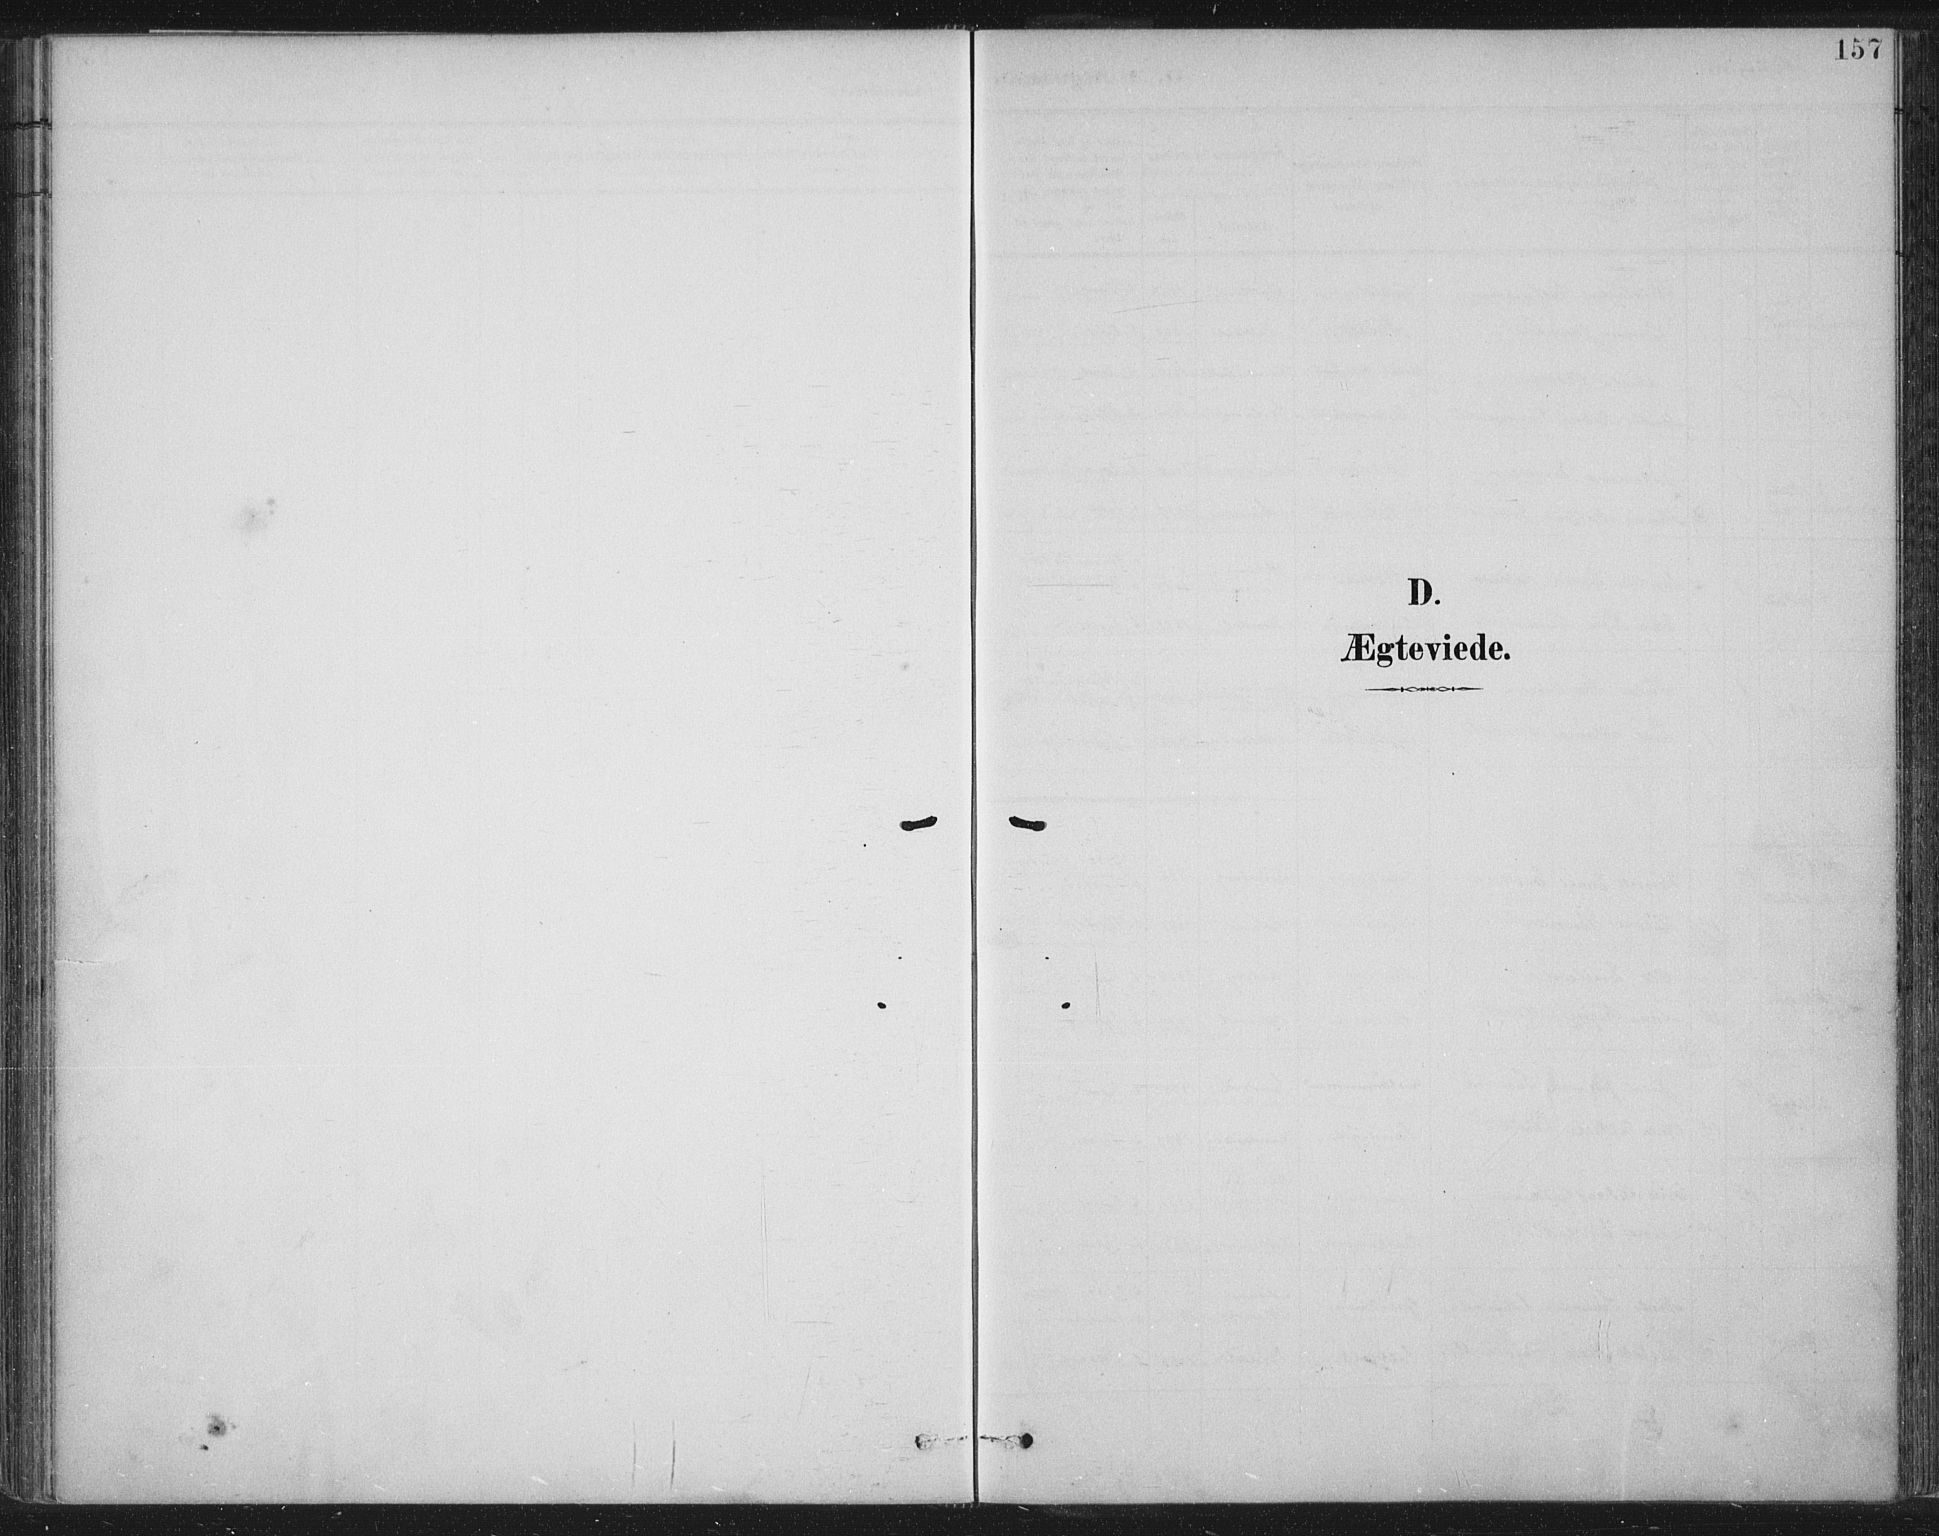 SAST, Tysvær sokneprestkontor, H/Ha/Haa/L0008: Ministerialbok nr. A 8, 1897-1918, s. 157